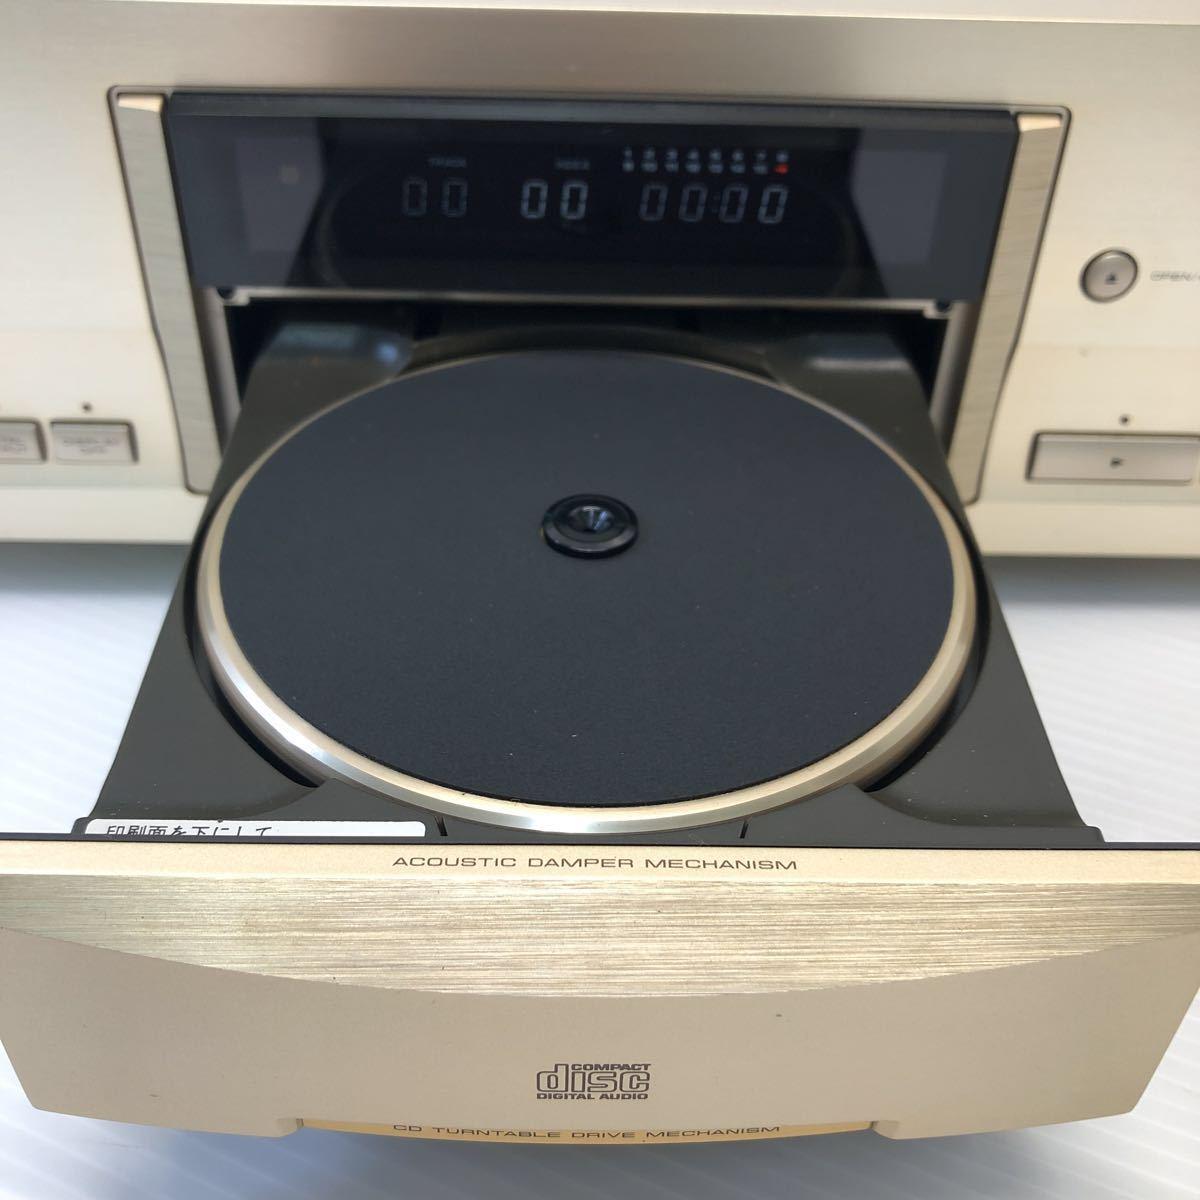 Pioneer パイオニア CDプレーヤー DACモード搭載 通電 CDトレイオープンクローズのみ確認 ジャンク扱い リモコン付き 1円スタート_画像5